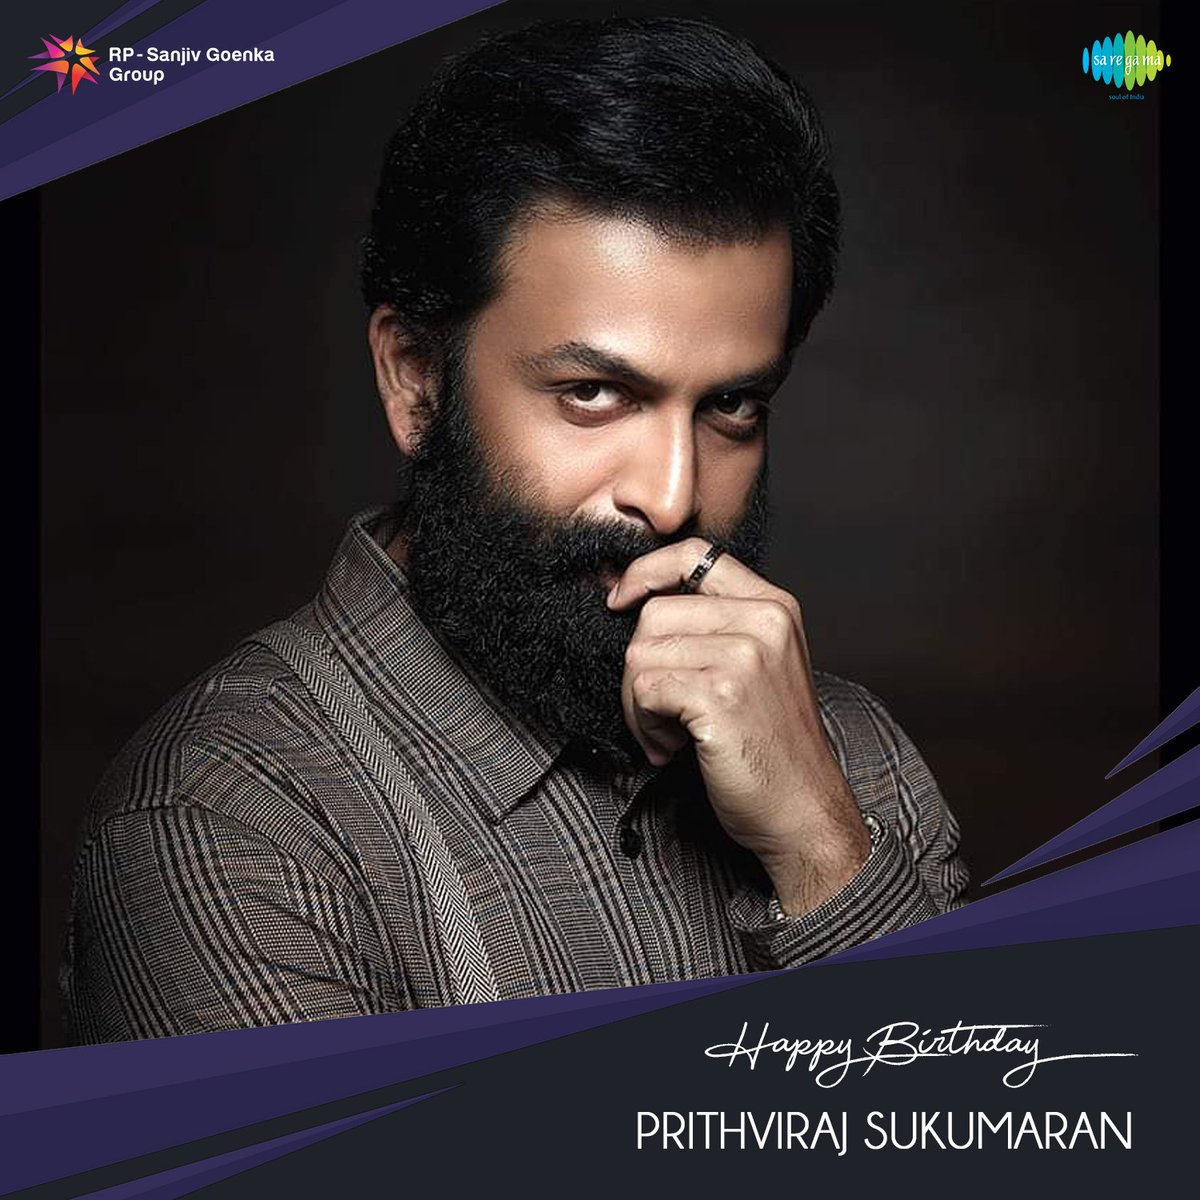 Birthday wishes to the versatile actor @PrithviOfficial   #SaregamaWishes #HBDPrithviraj #HappyBirthdayPrithviraj https://t.co/EEe5R0IPvy